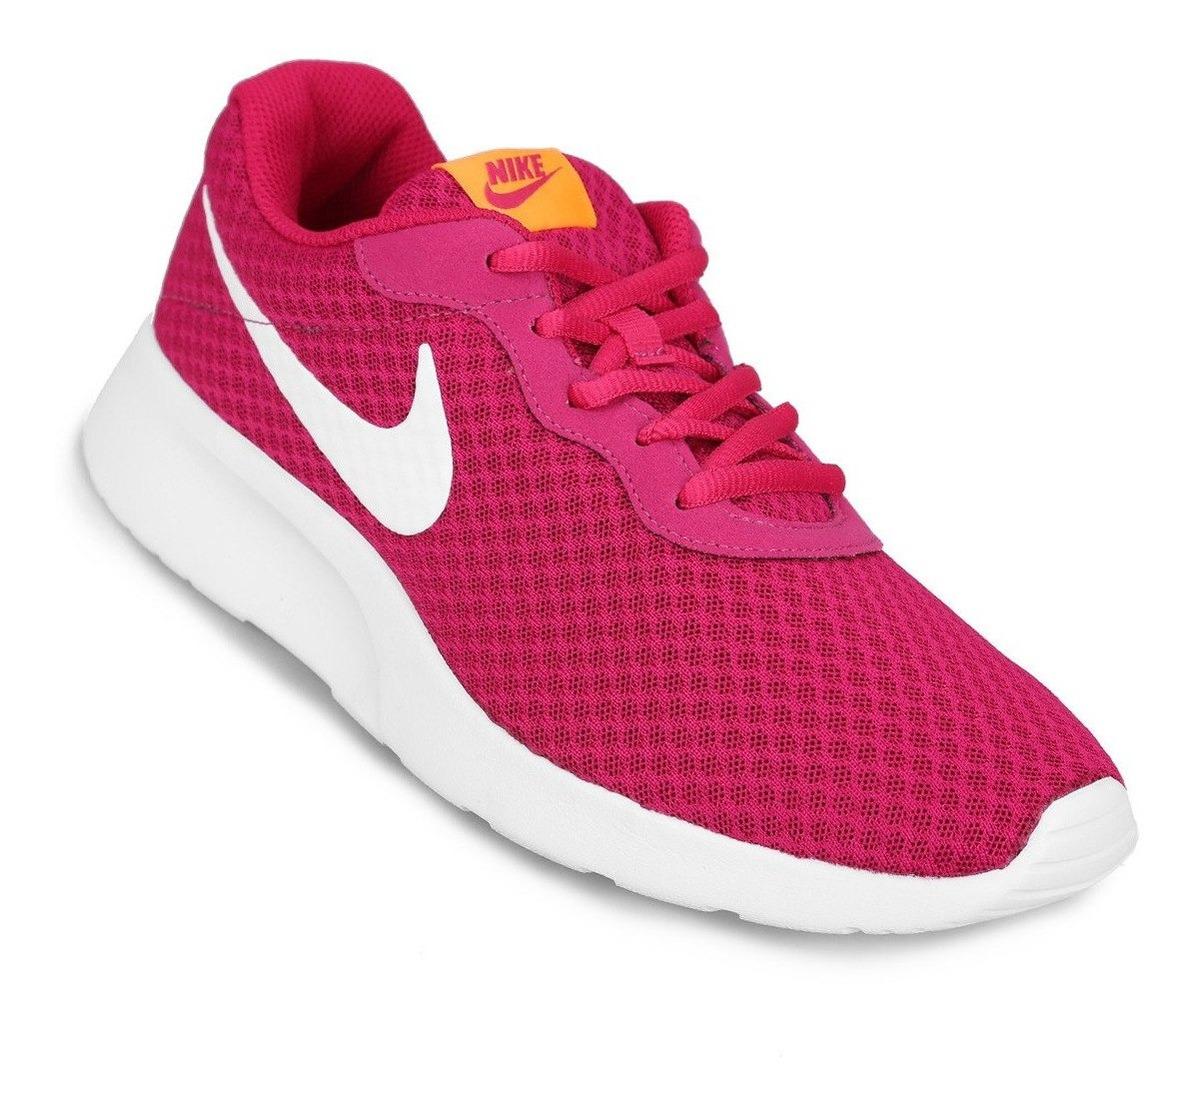 Zapatillas Nike Tanjun Mujer Rosa Original